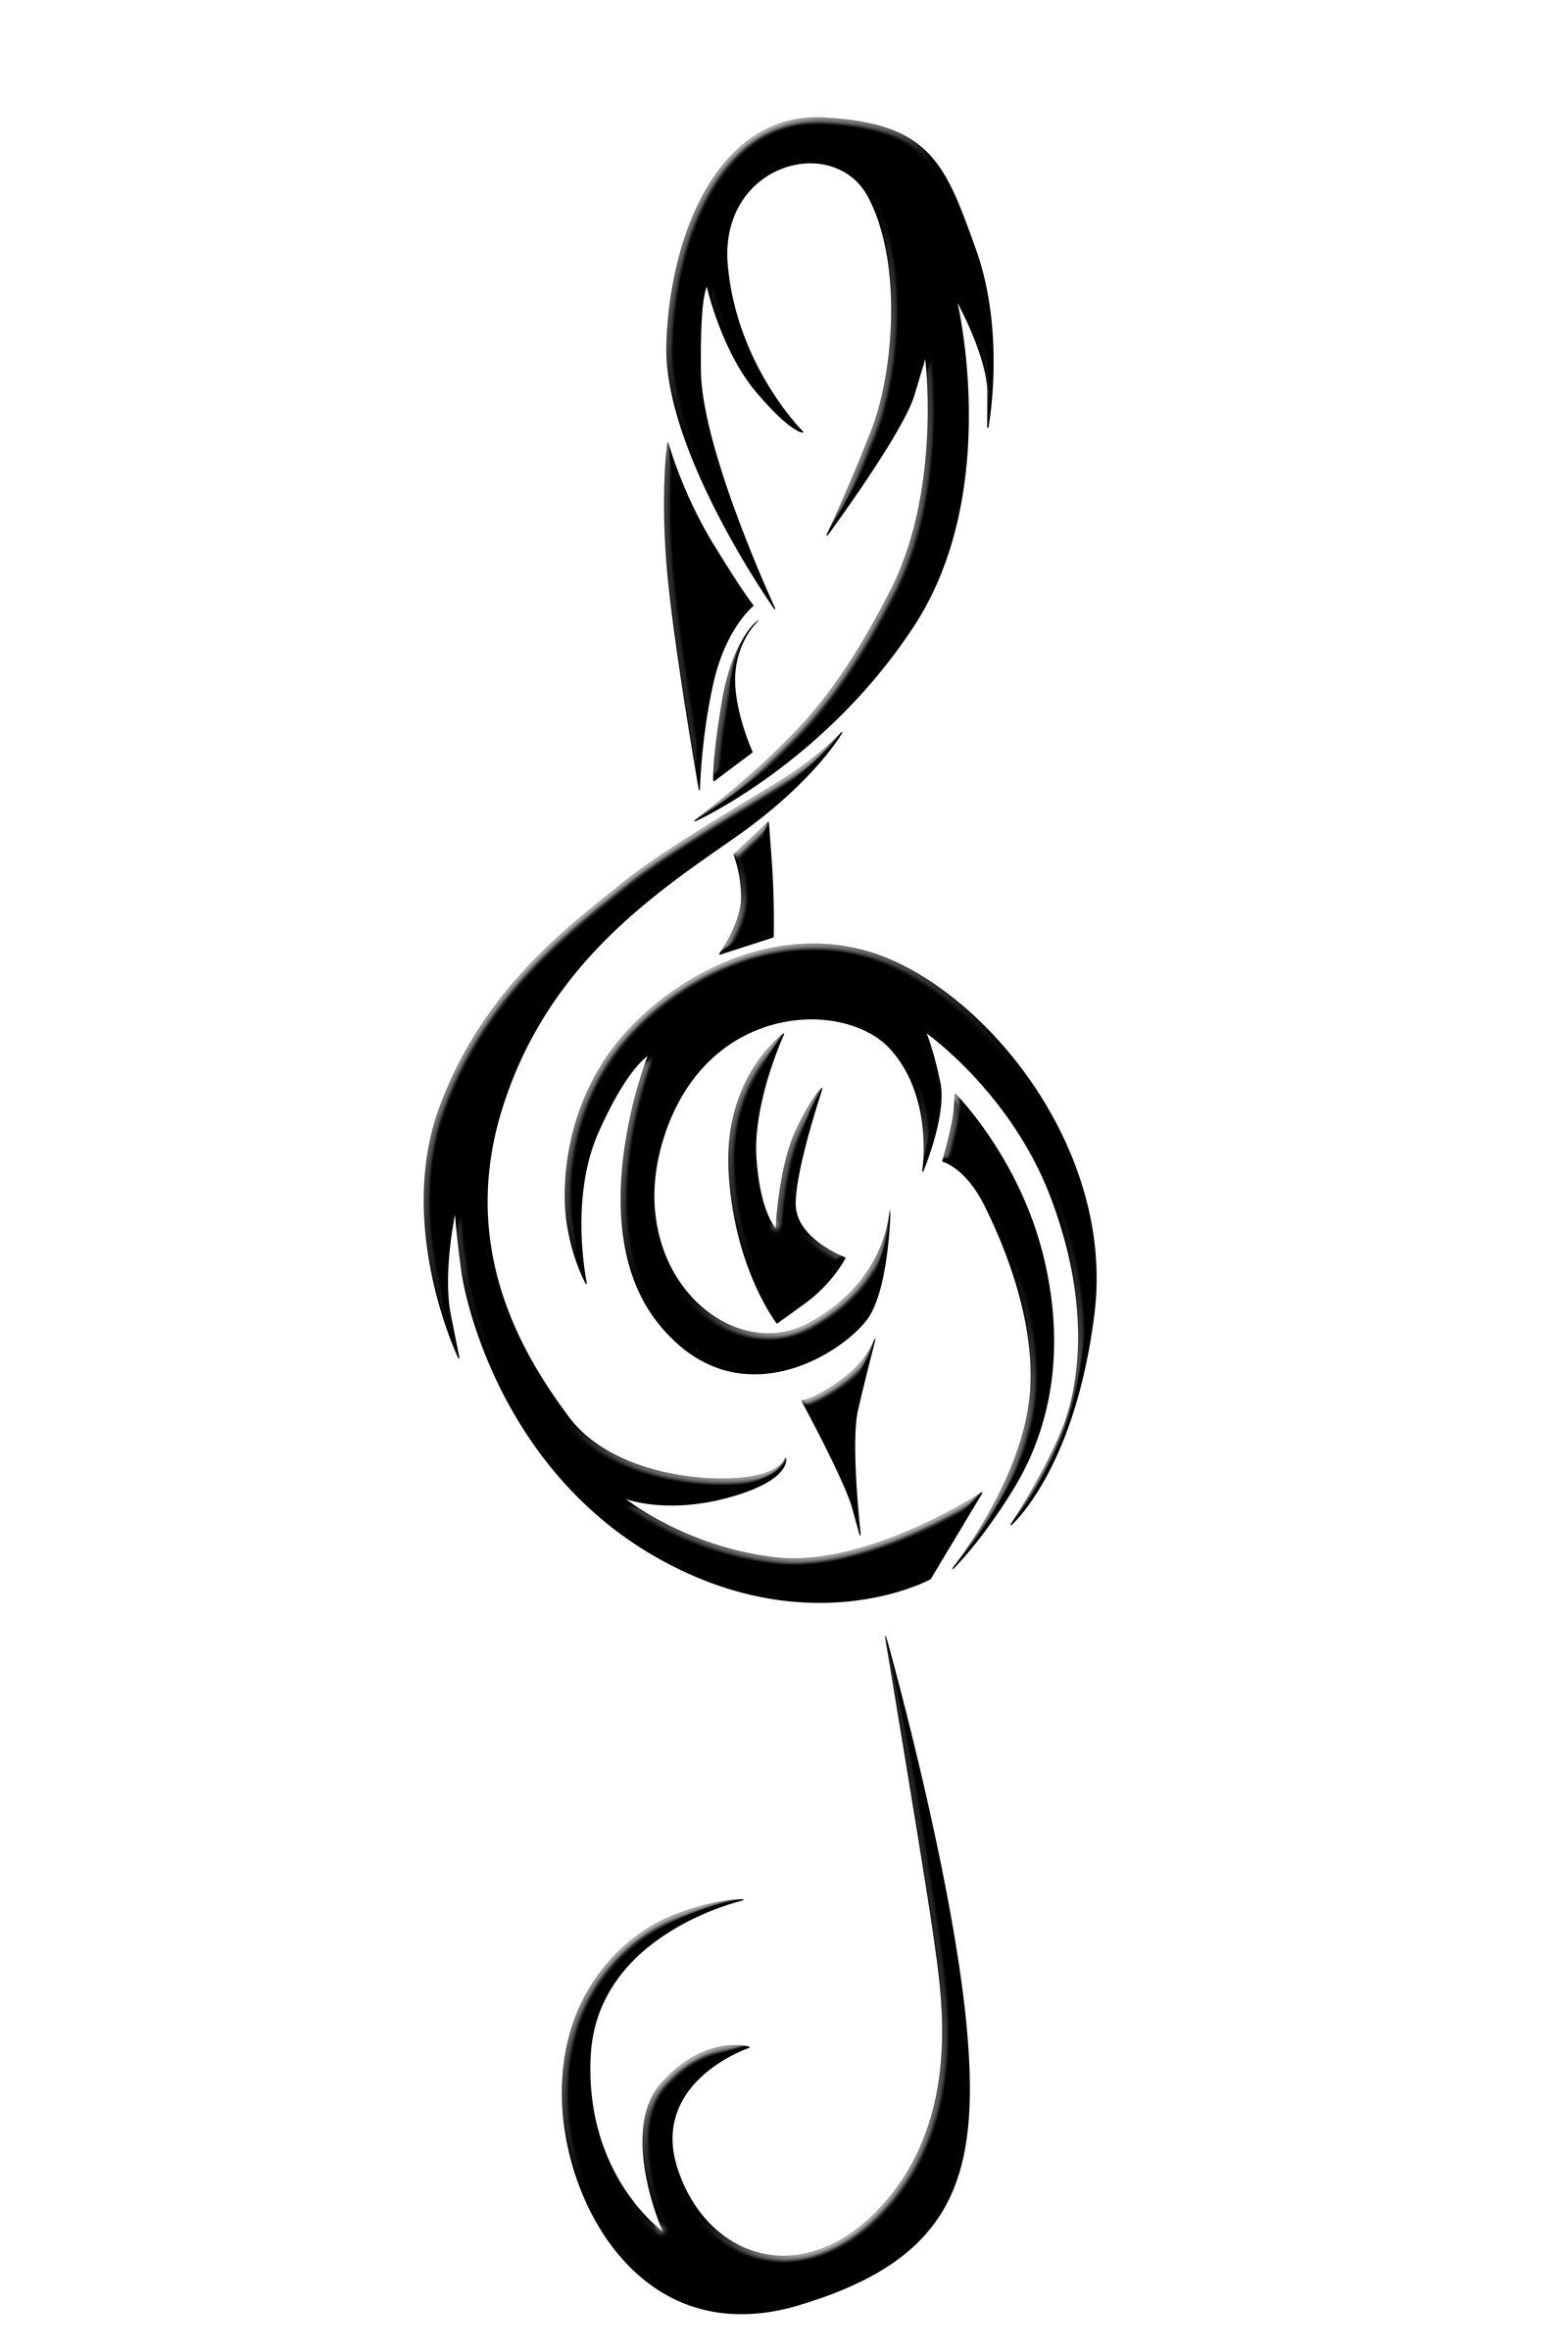 treble clef vector art clipart best tattoo art pinterest rh pinterest com treble clef clip art free vector treble clef symbol clip art